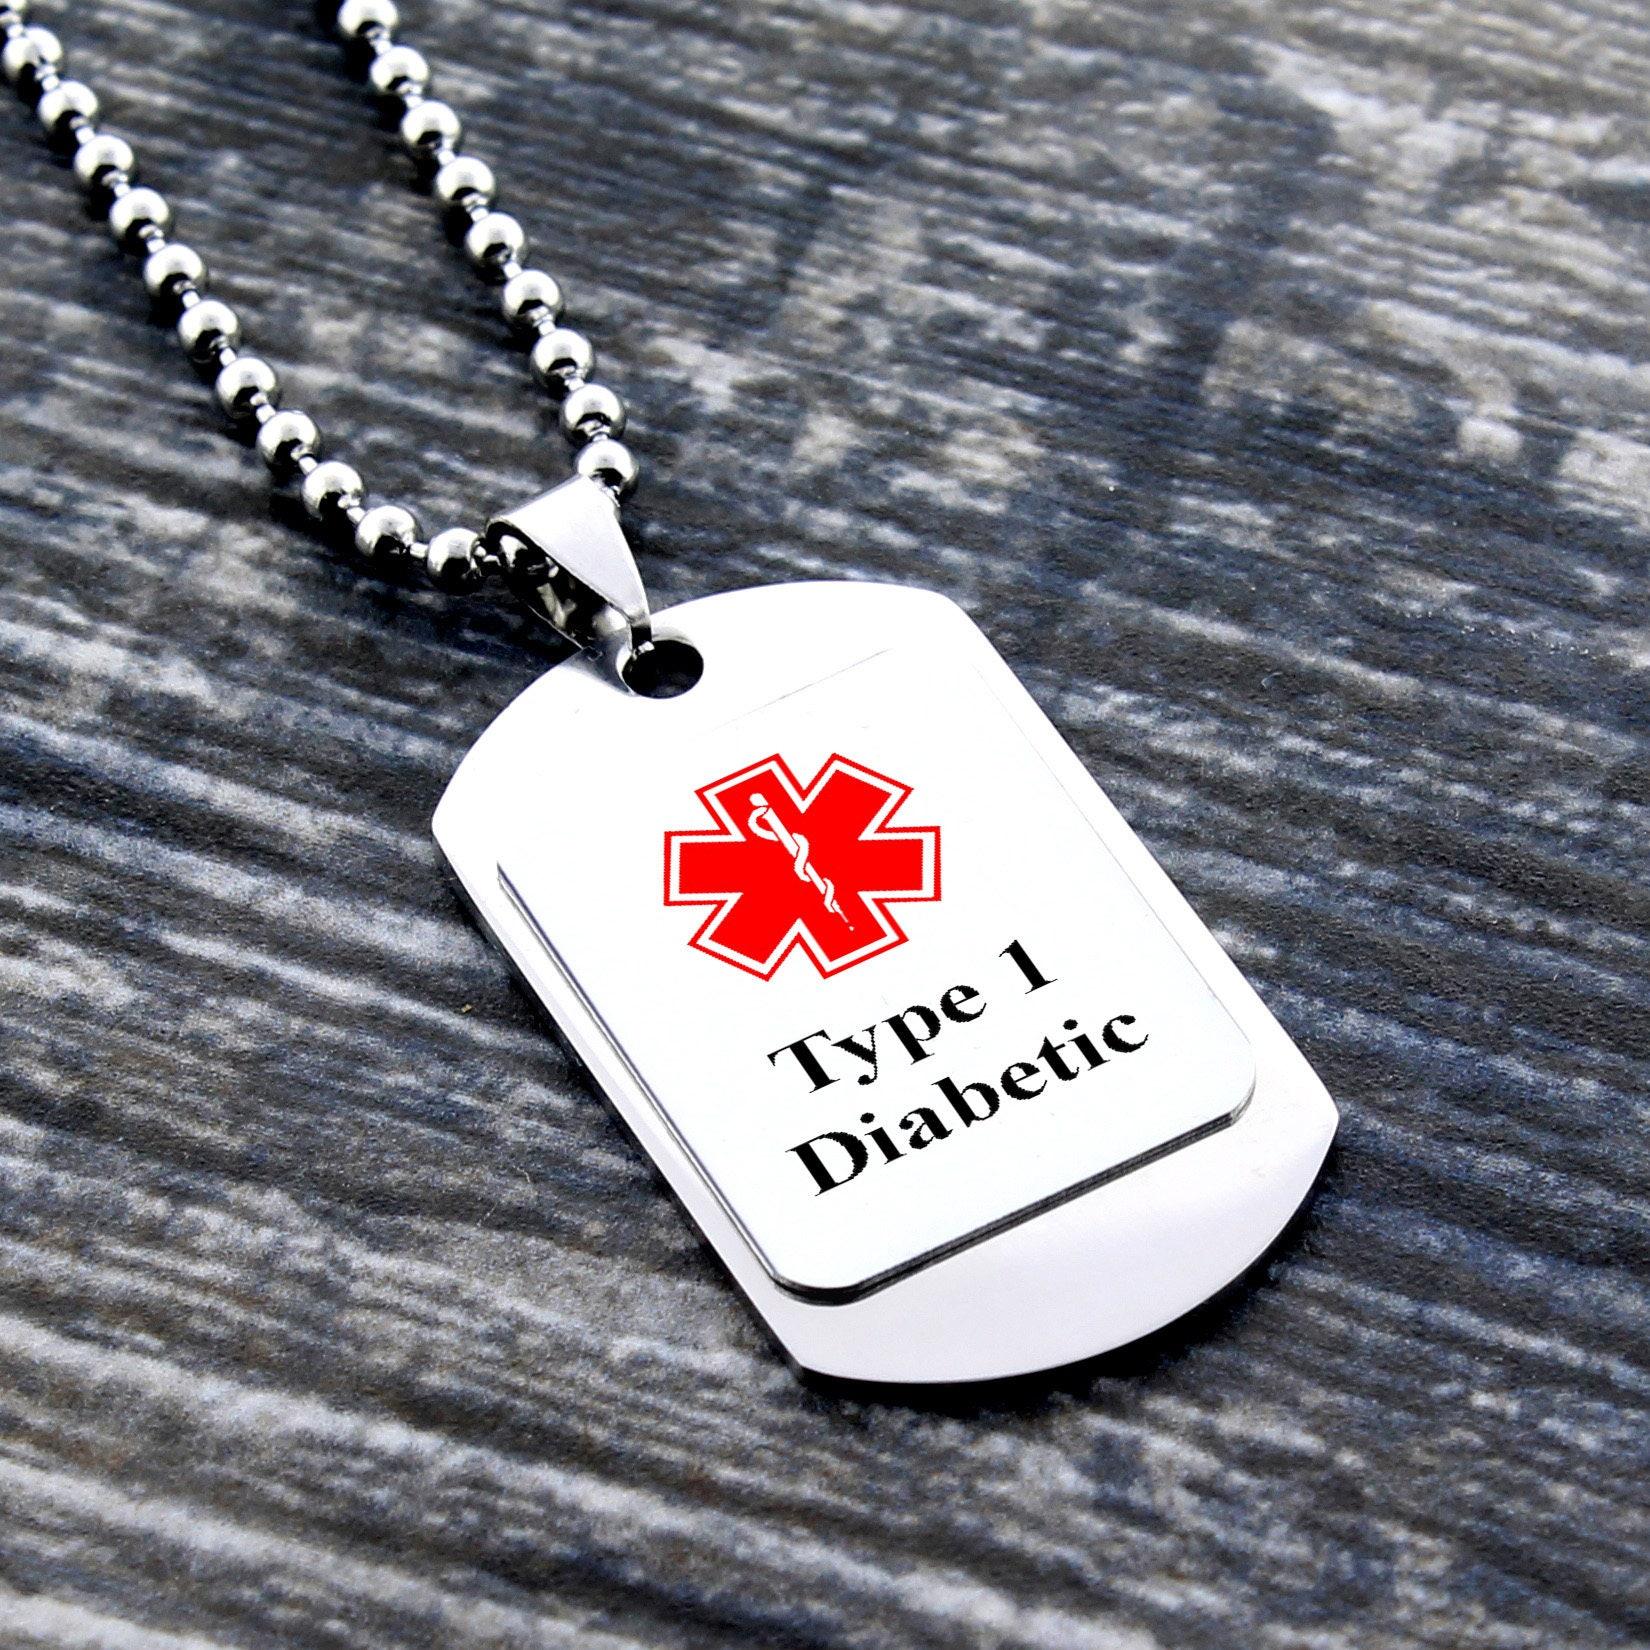 Medic Alert Necklace: Medical Alert Necklace Medical Alert Jewelry Medical ID